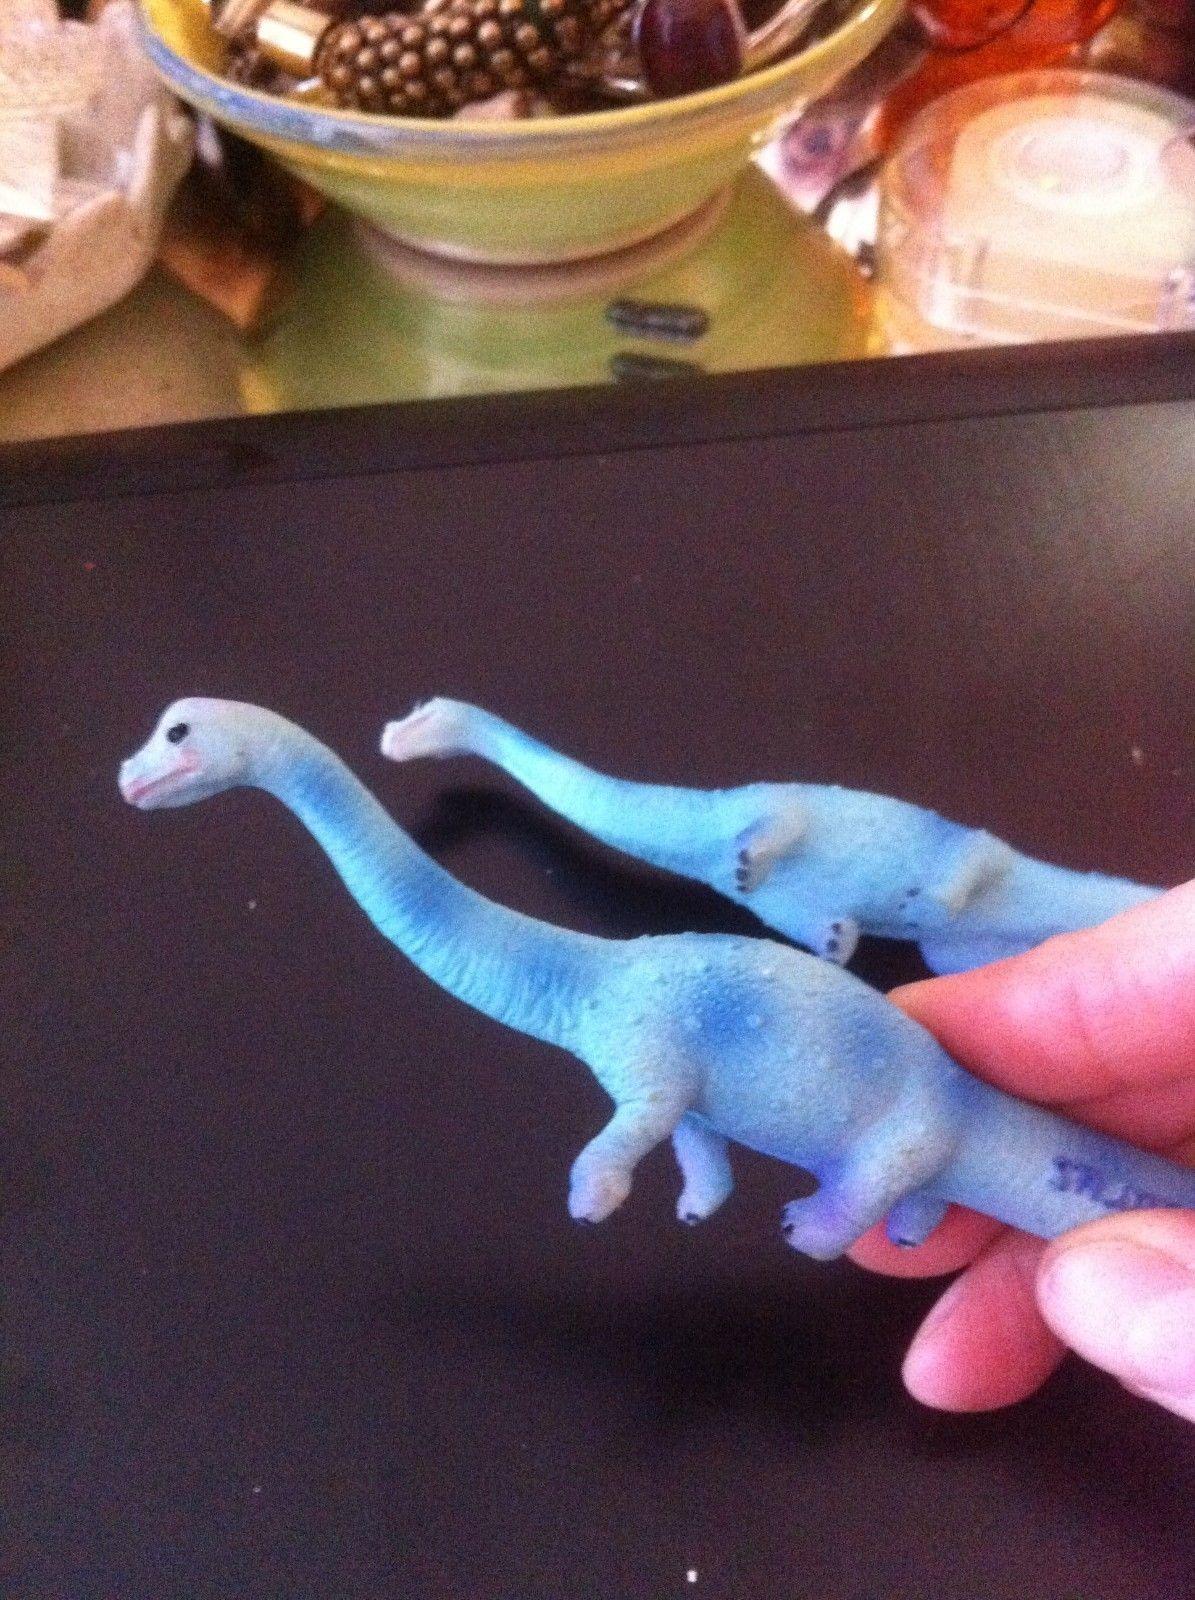 pen novelty apatasaurus dinosaur pen w name on side looks like brontosaurus